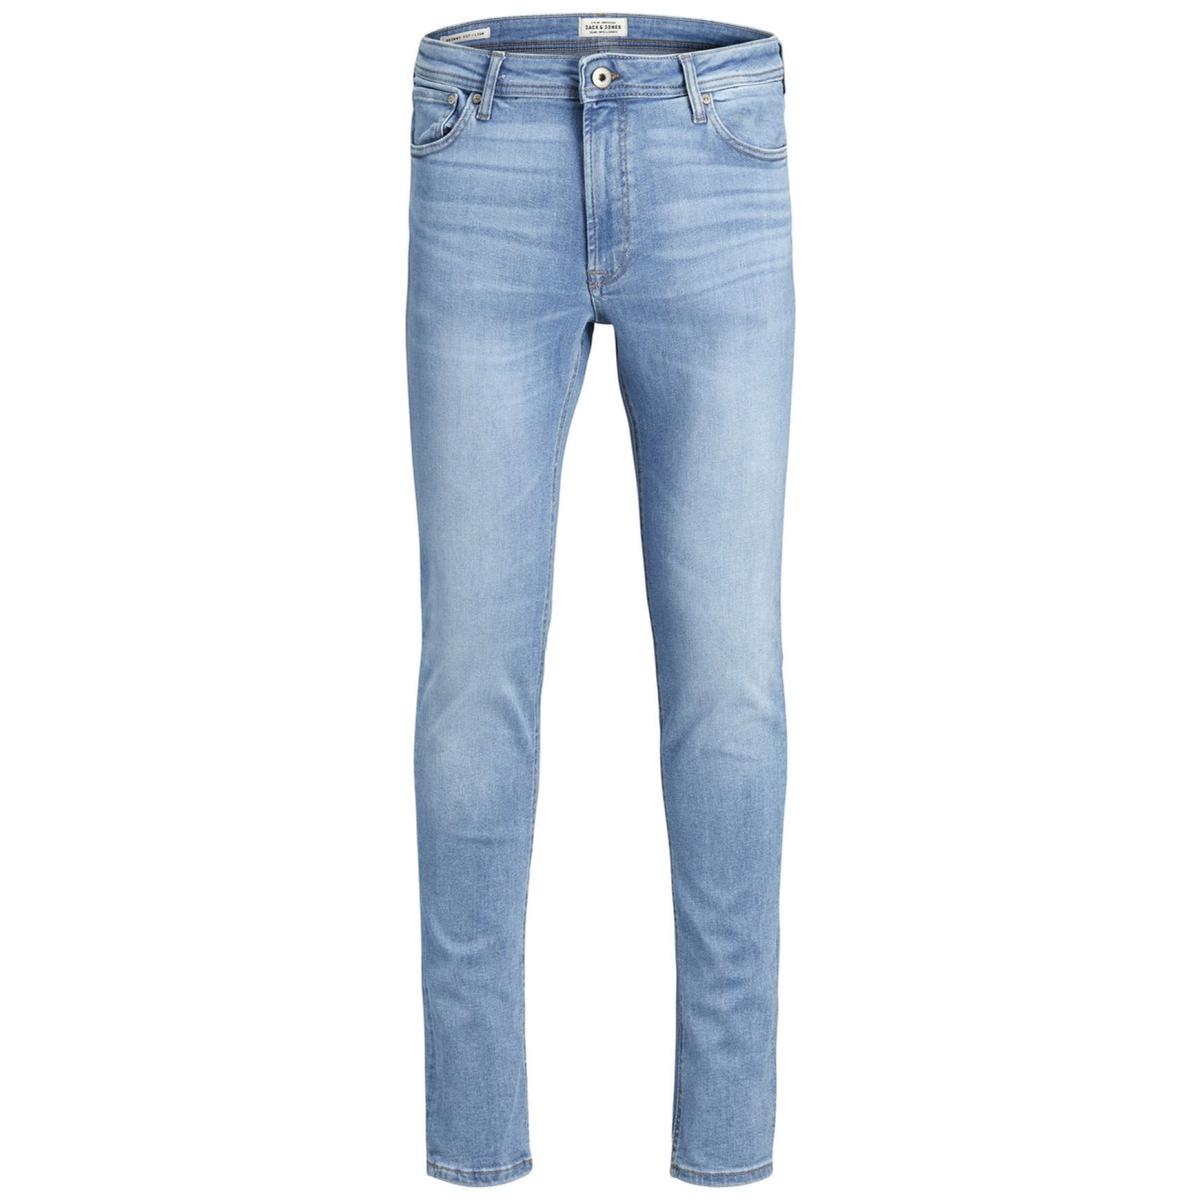 jjiliam jjoriginal am 670 50sps noos 12133309 jack & jones jeans blue denim